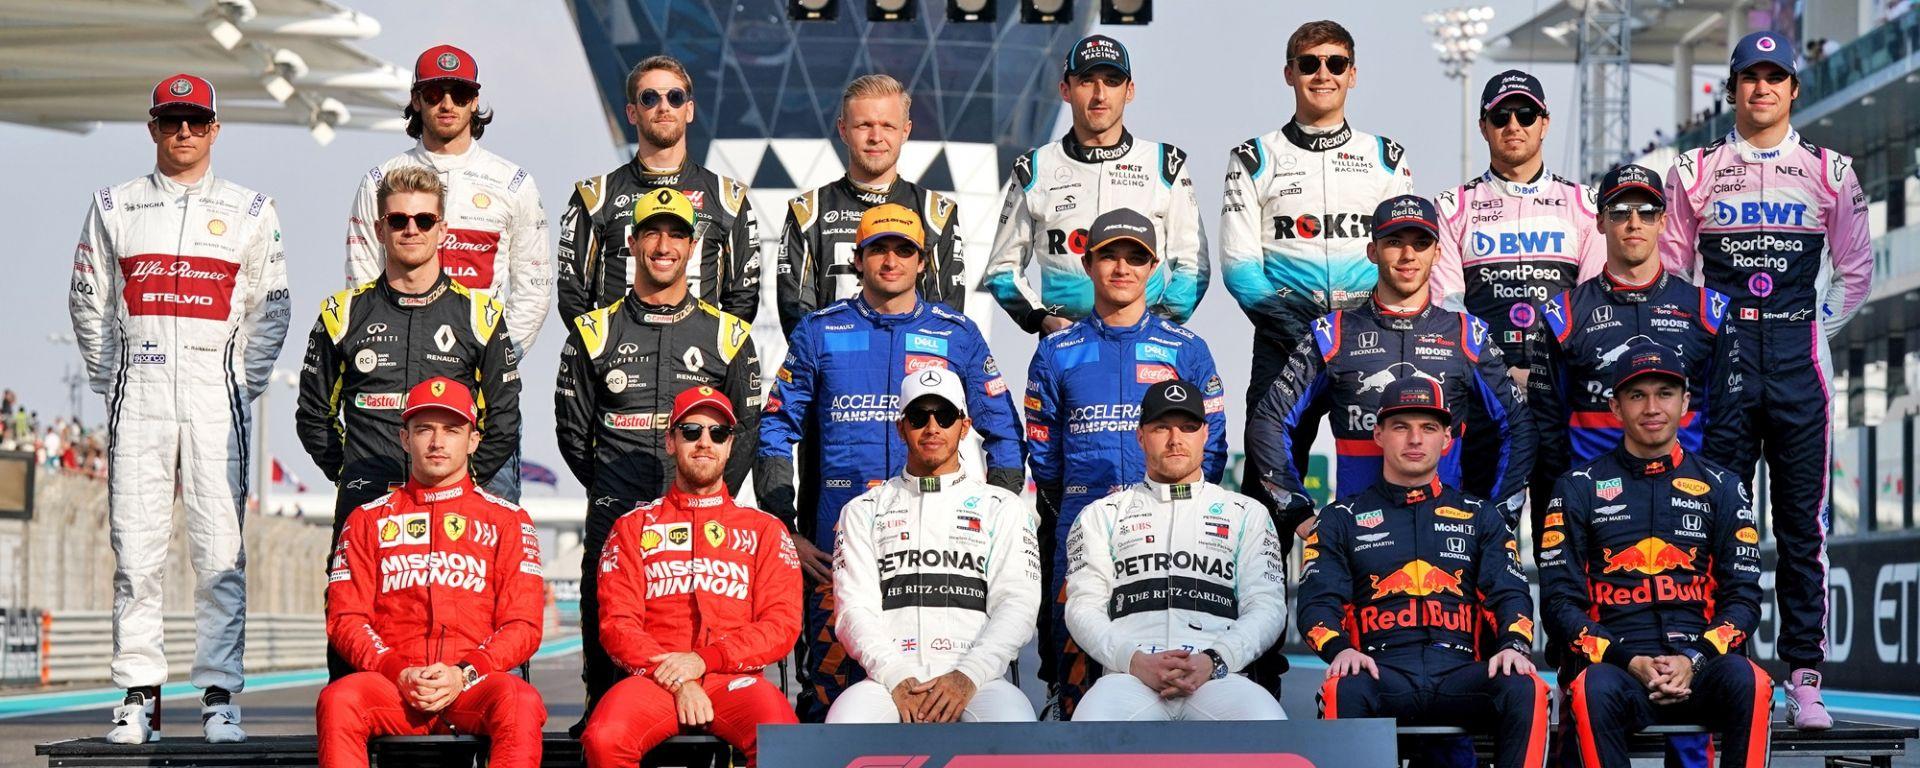 F1 GP Abu Dhabi 2019, Tutti i piloti del mondiale